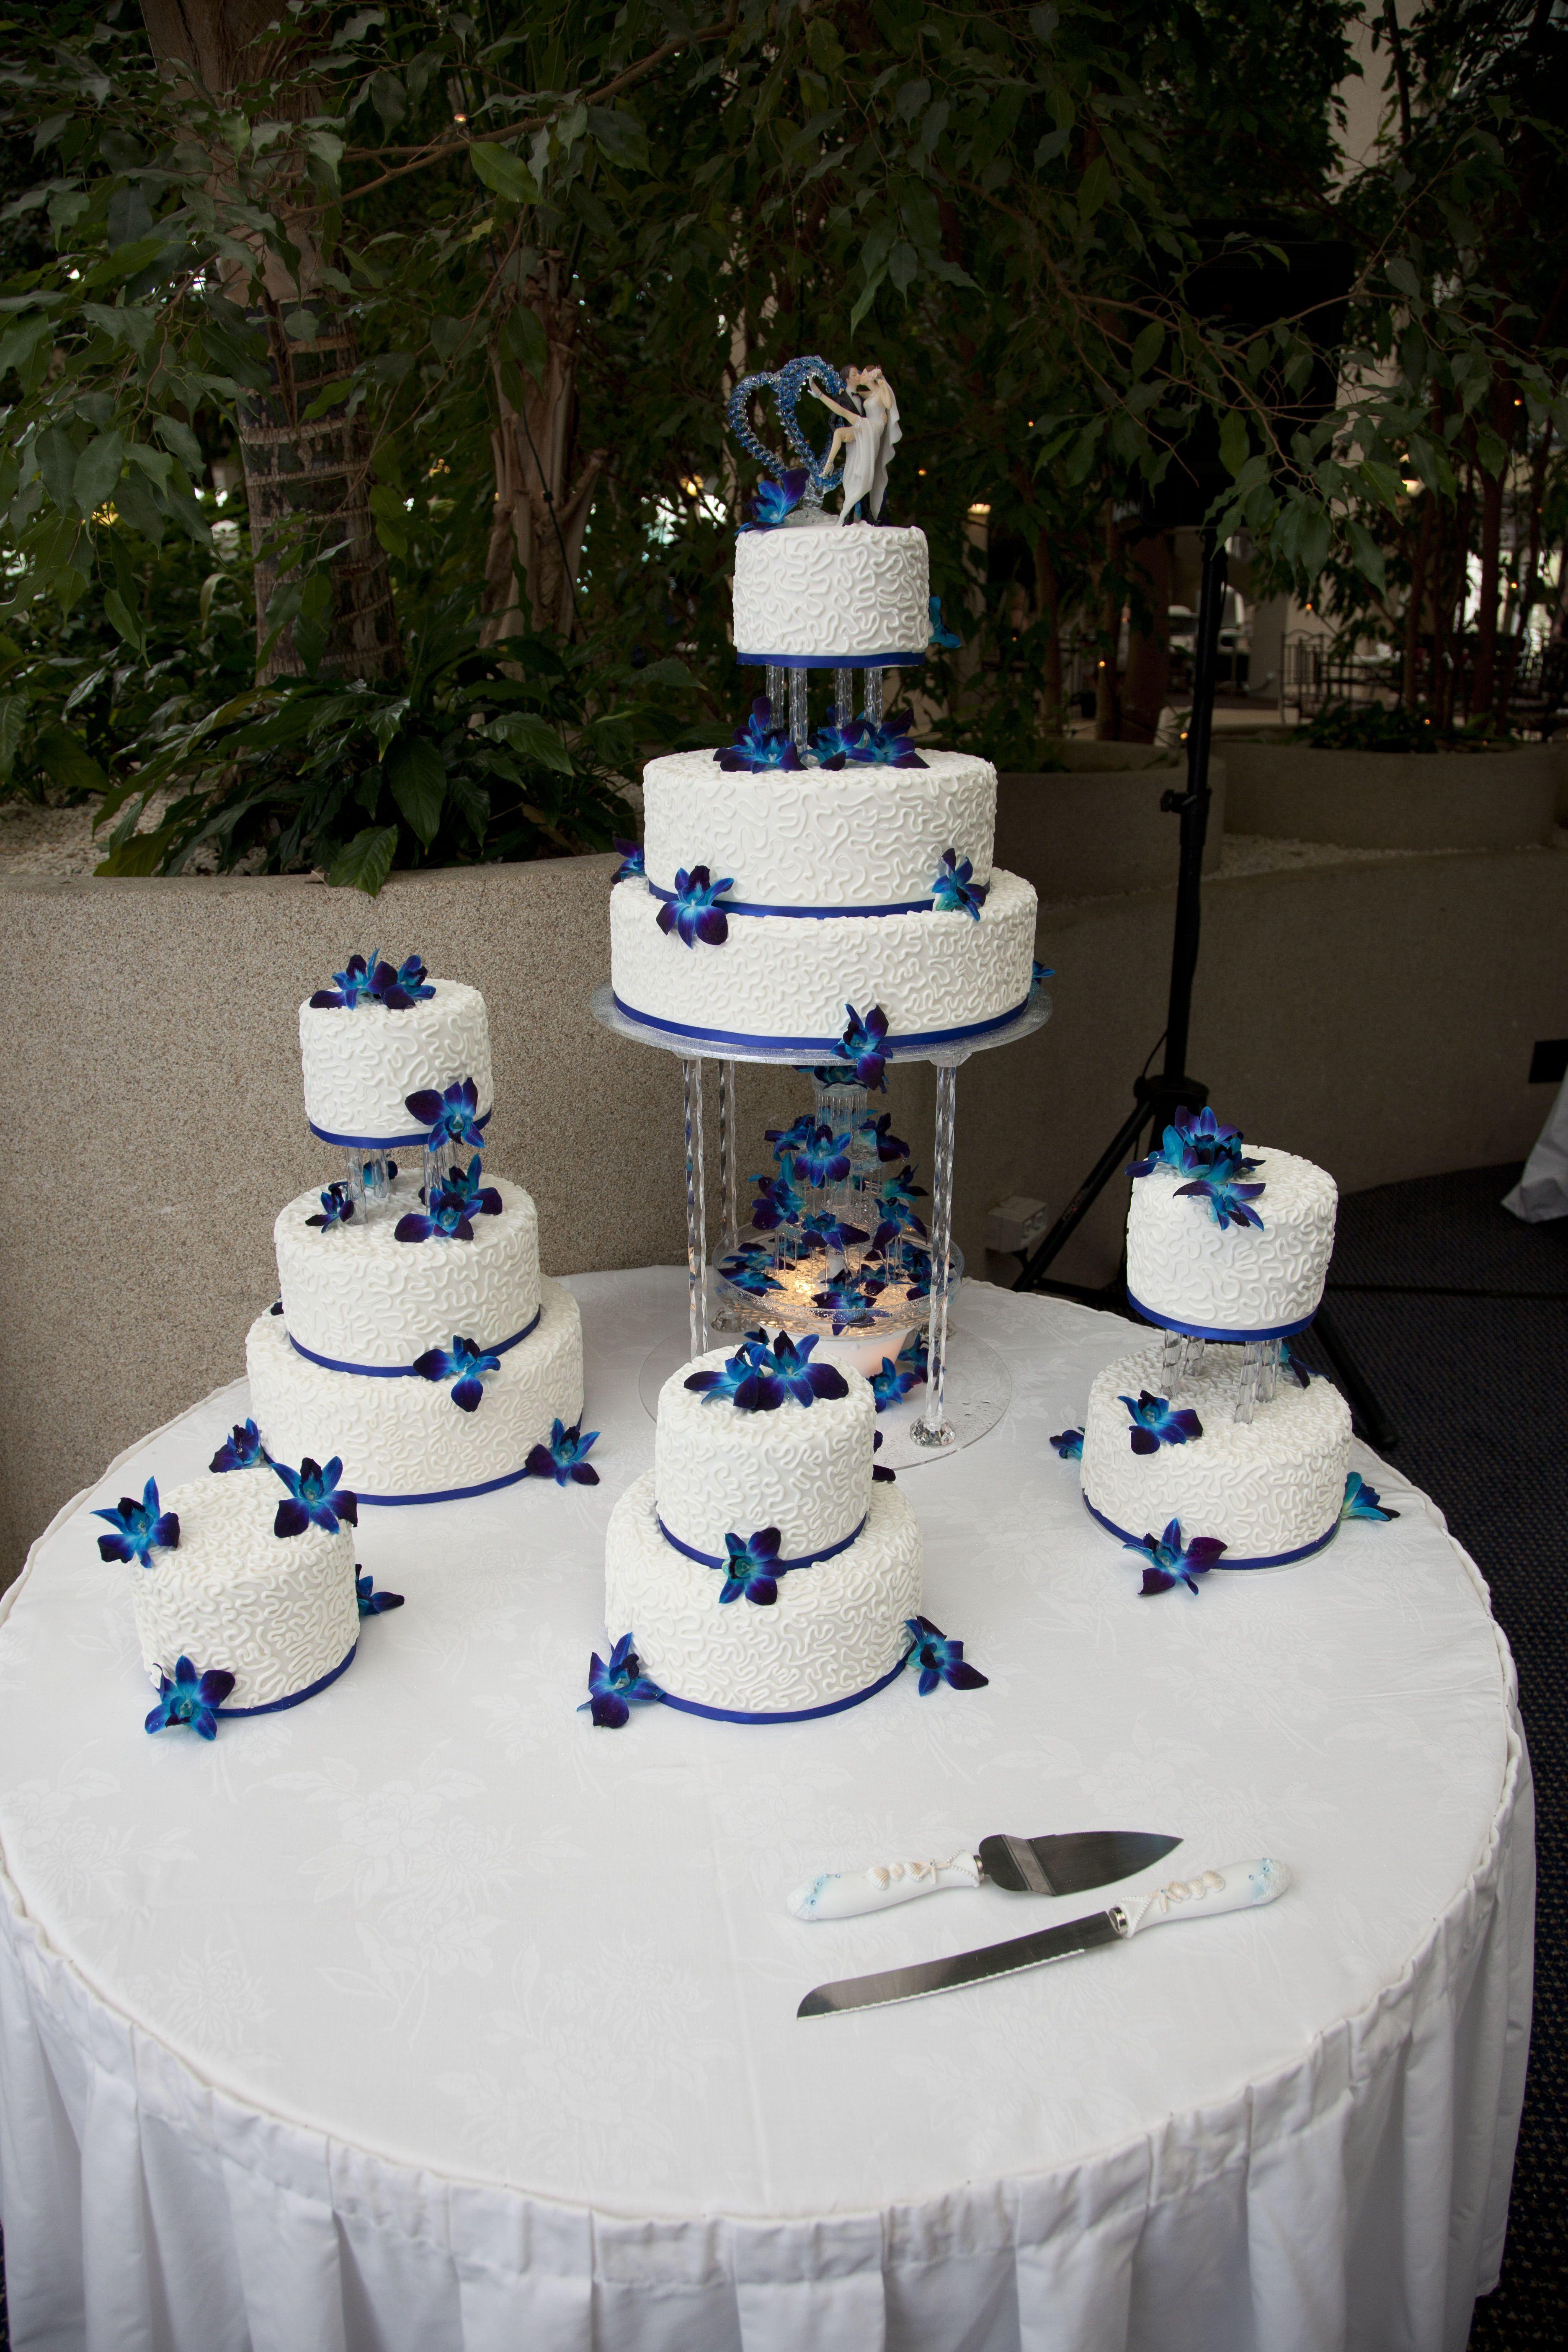 Royal Blue Wedding Cake Decorated With White Chocolate